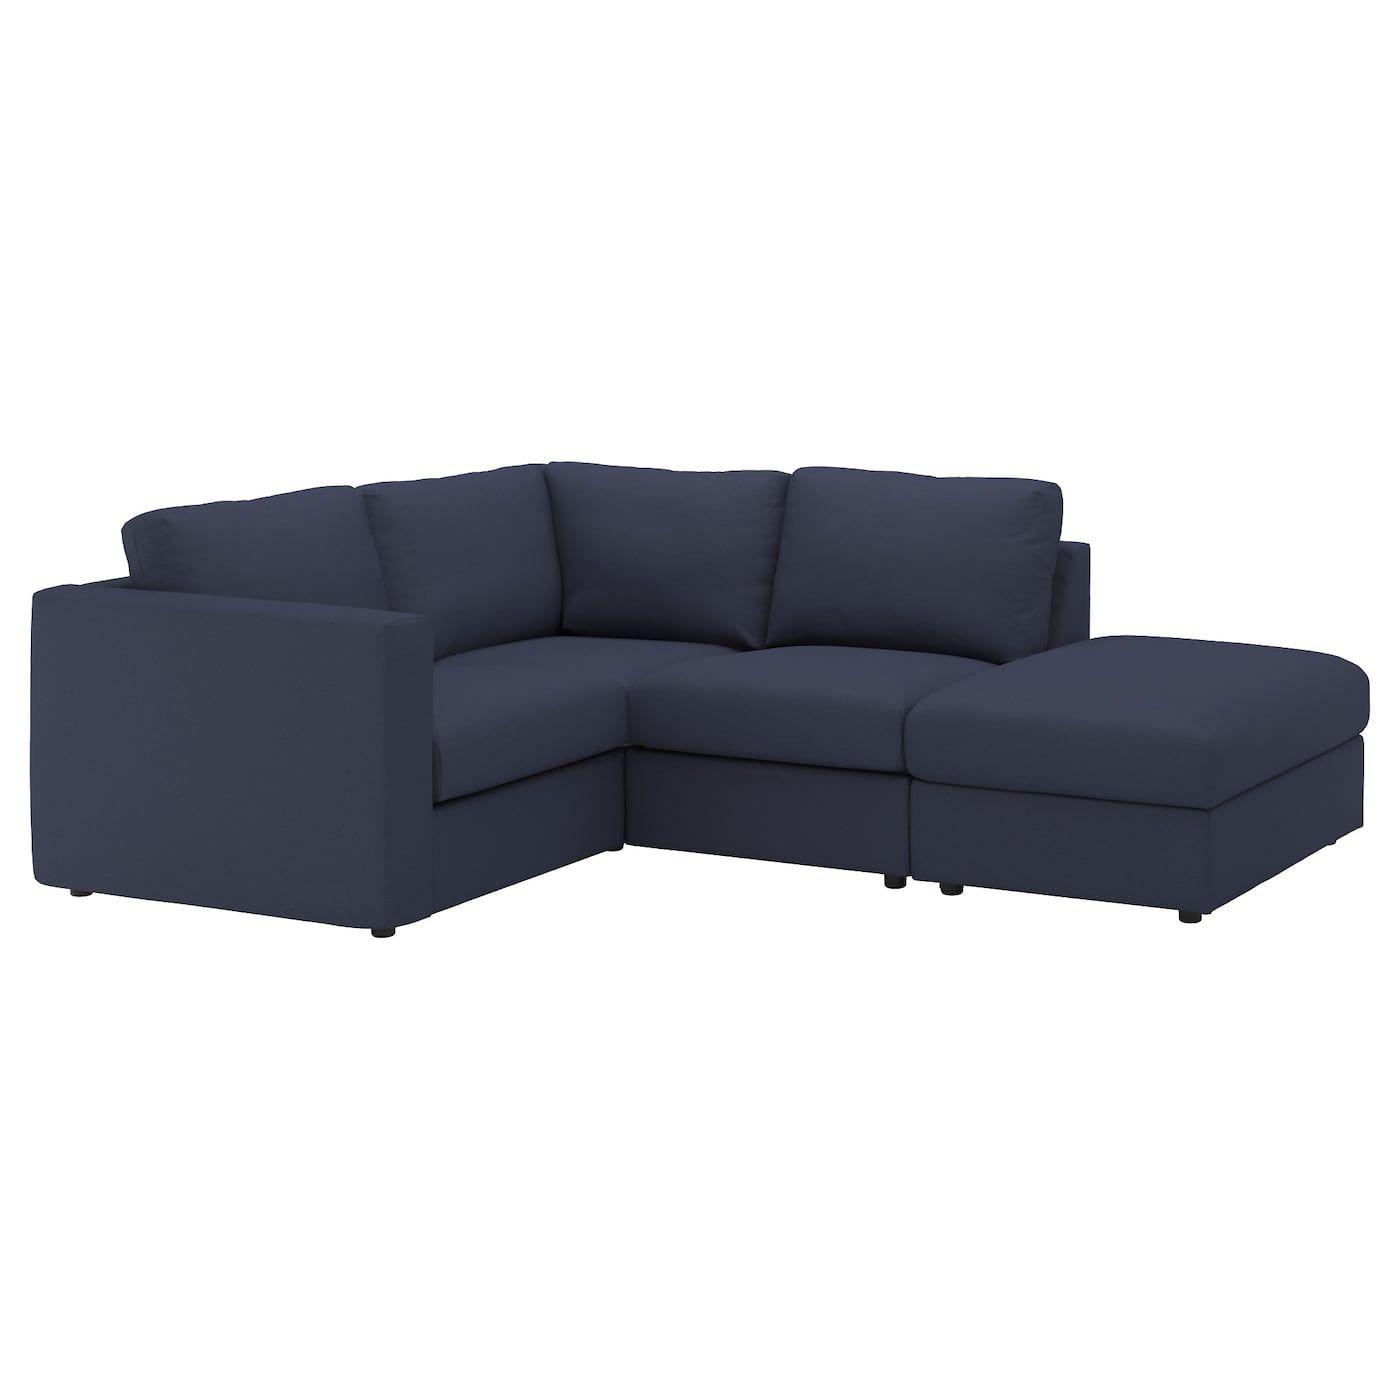 Vimle Sectional 3 Seat Corner With Open End Orrsta Black Blue Modular Sectional Sofa Corner Sofa Ikea Corner Sofa